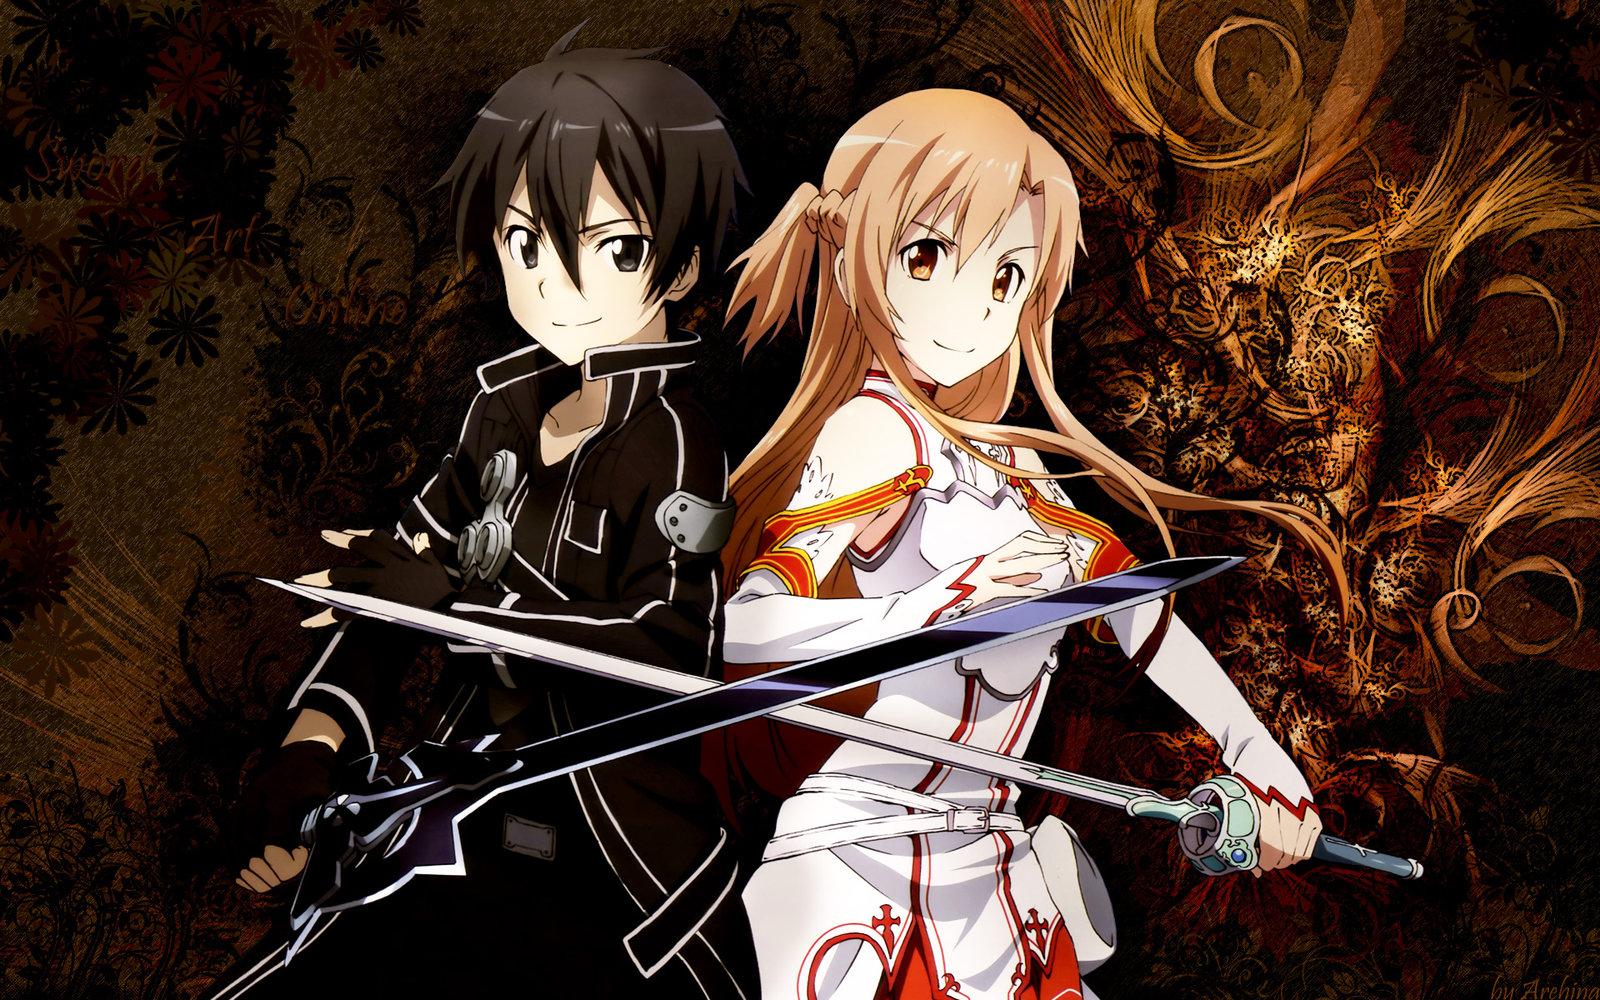 Sword art online SAO asuna kirito wallpaper by Arehina 1600x1000